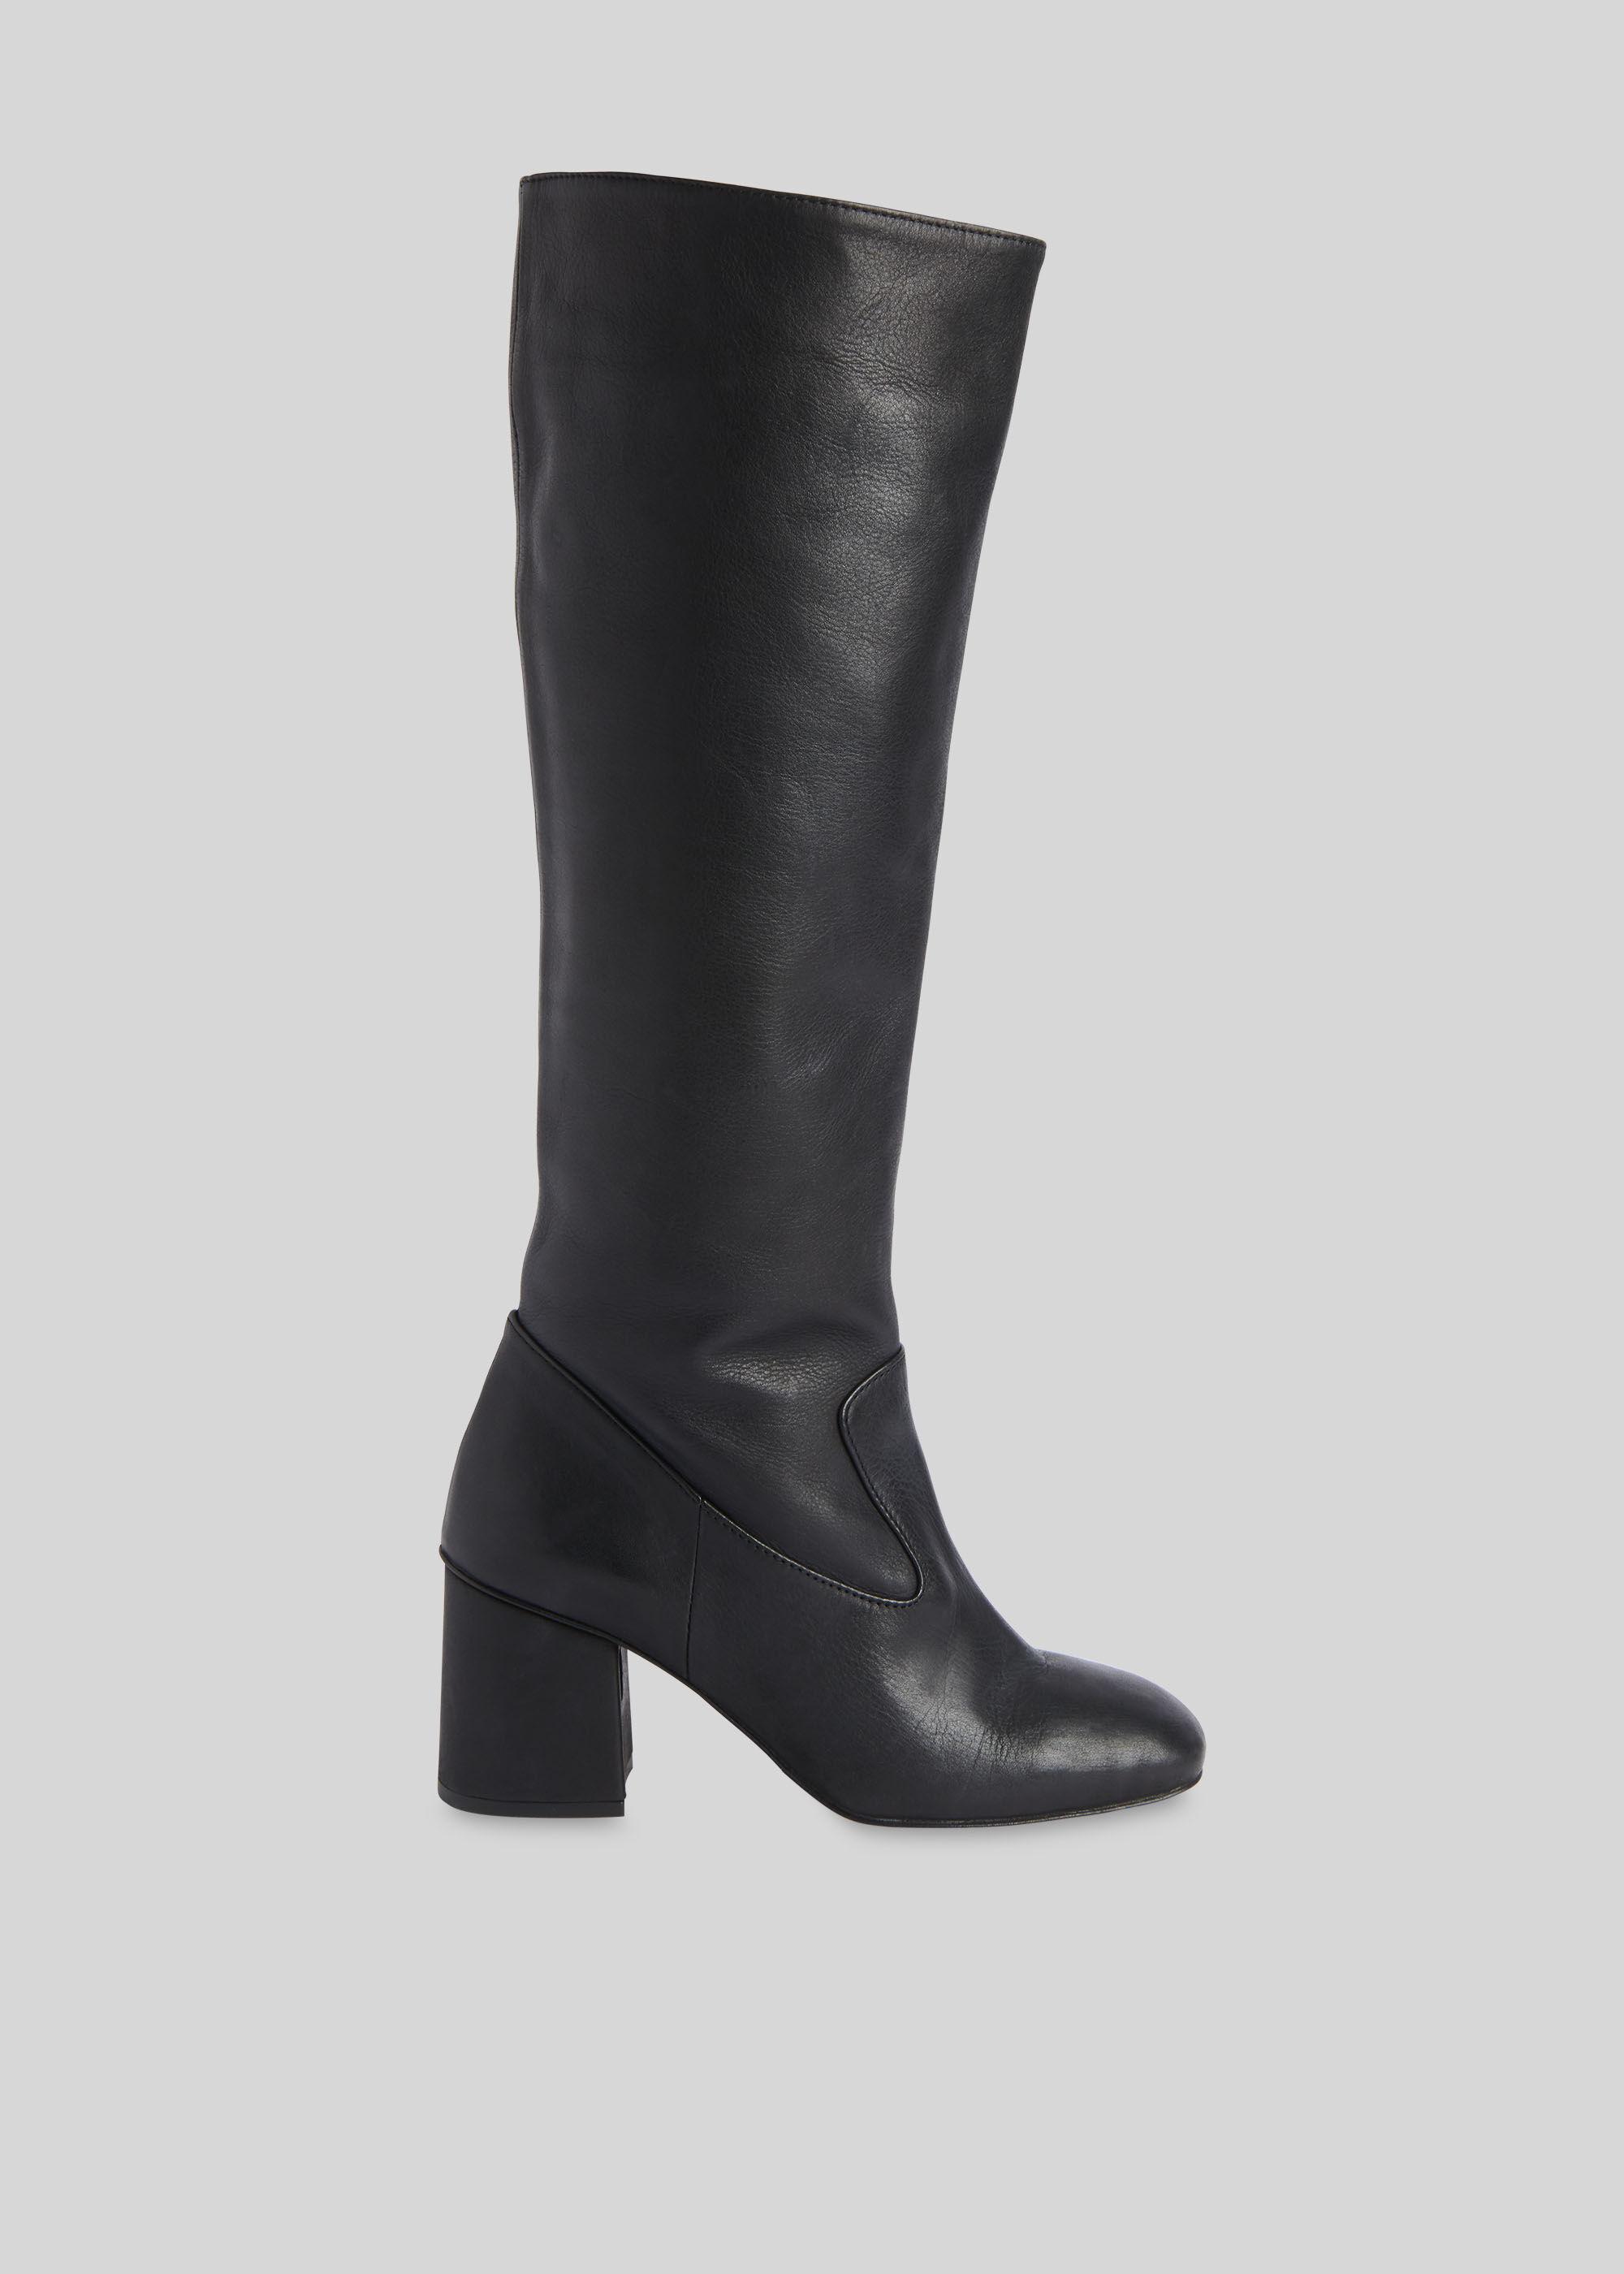 Black Hazel Knee High Boot | WHISTLES